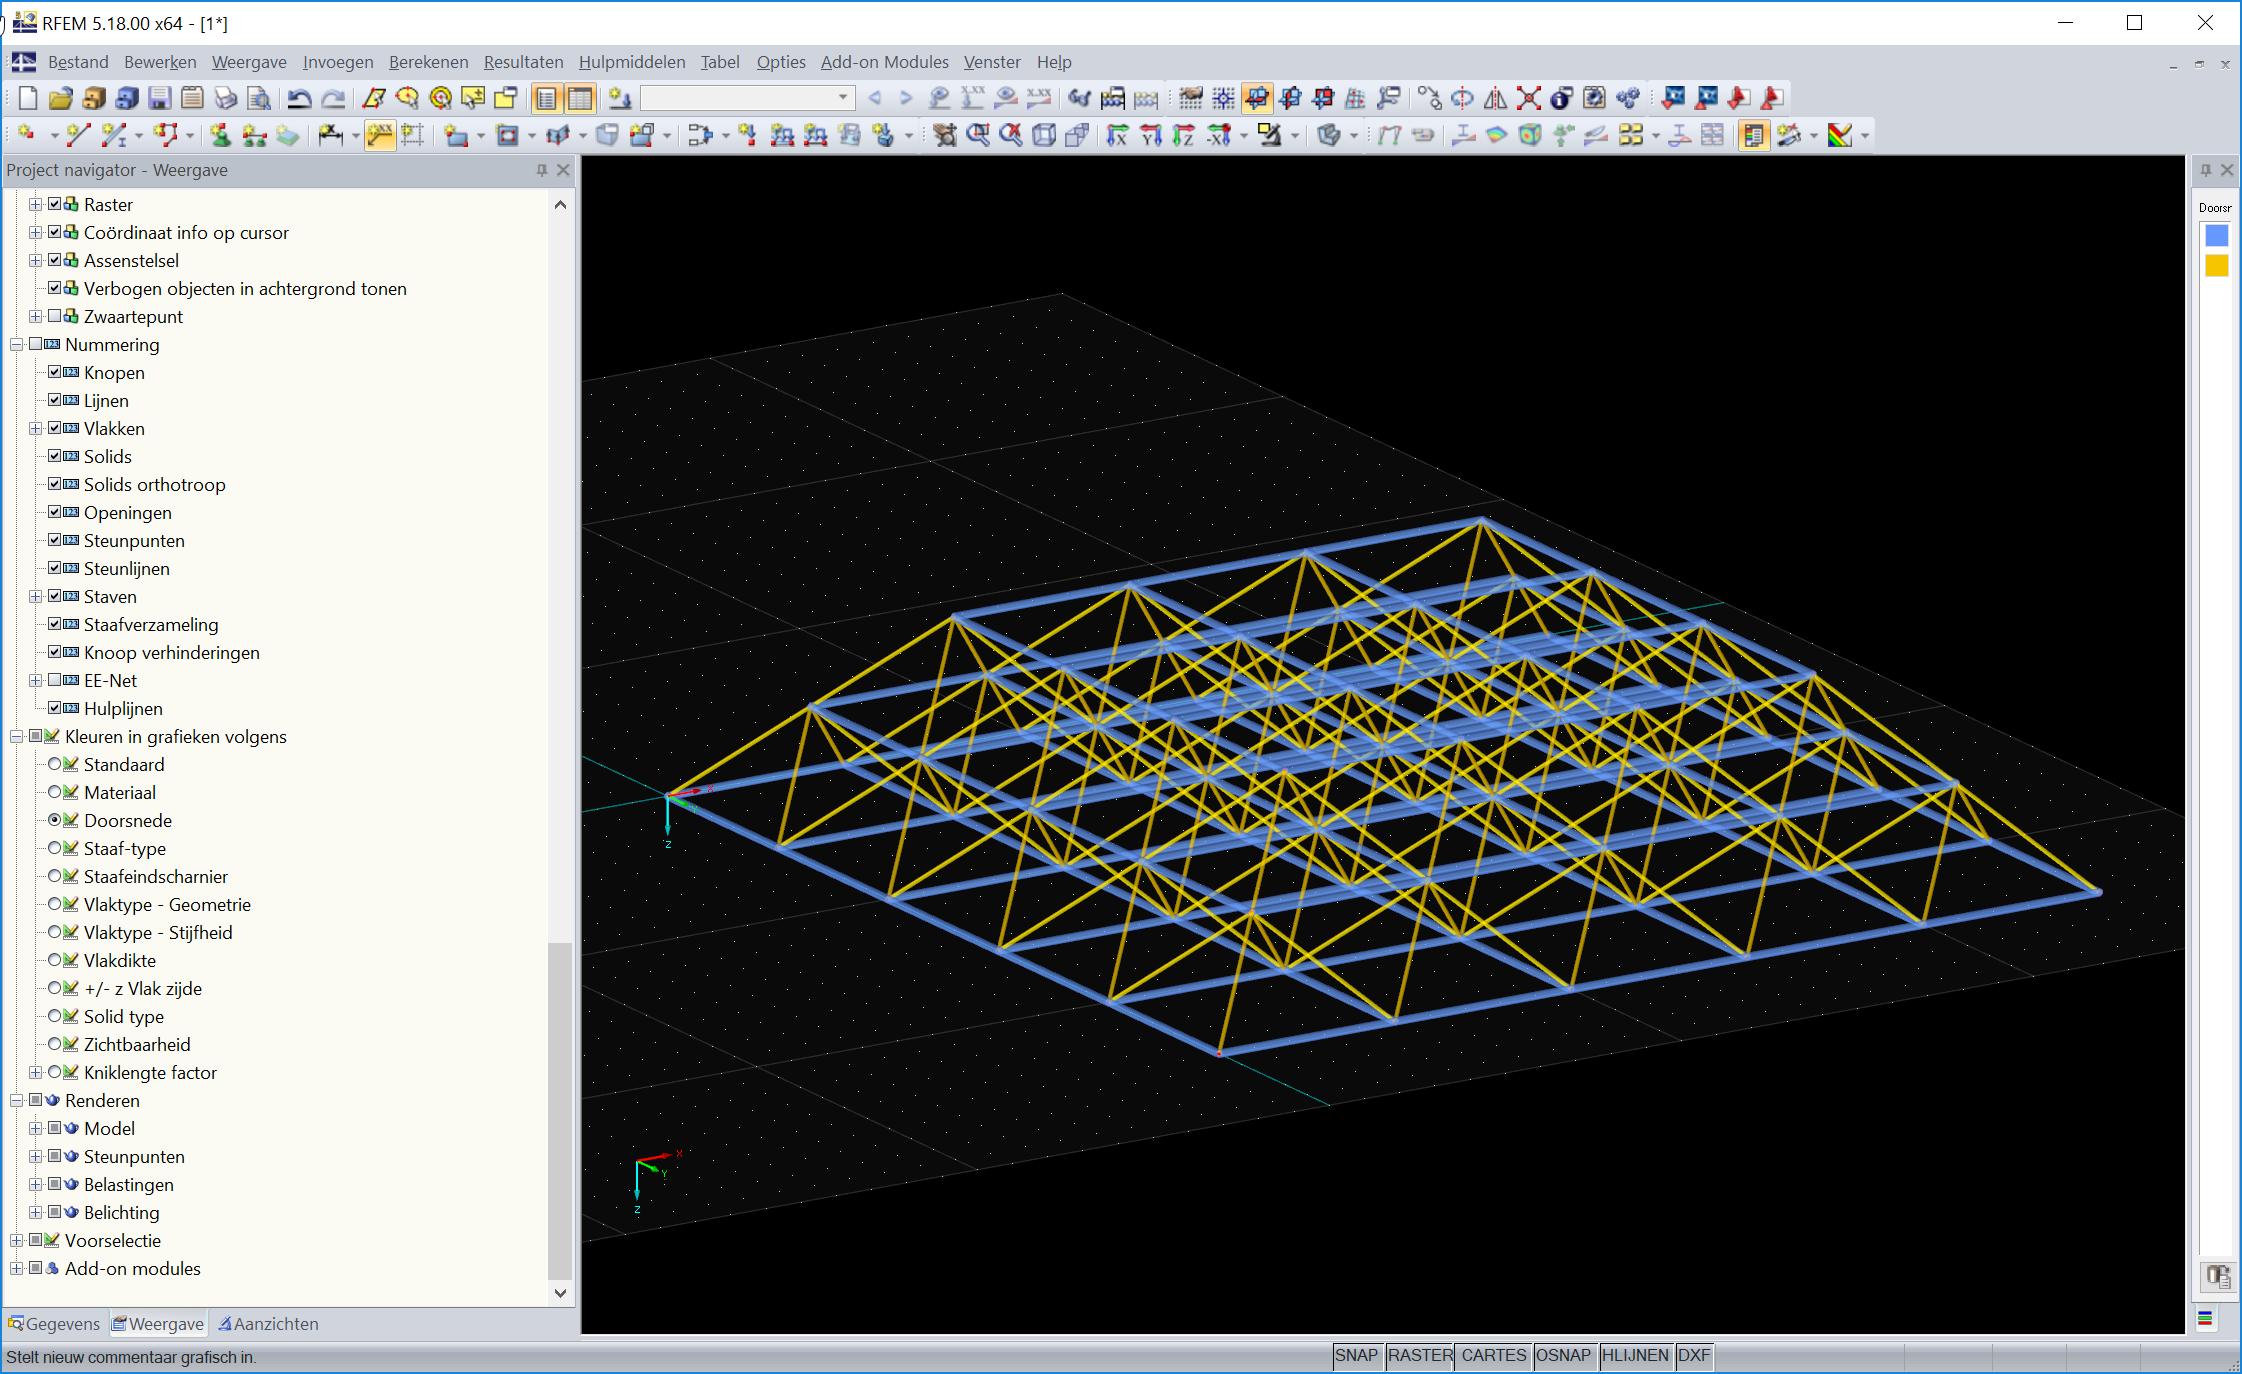 3D vakwerken modelleren en berekenen in RFEM rekensoftware